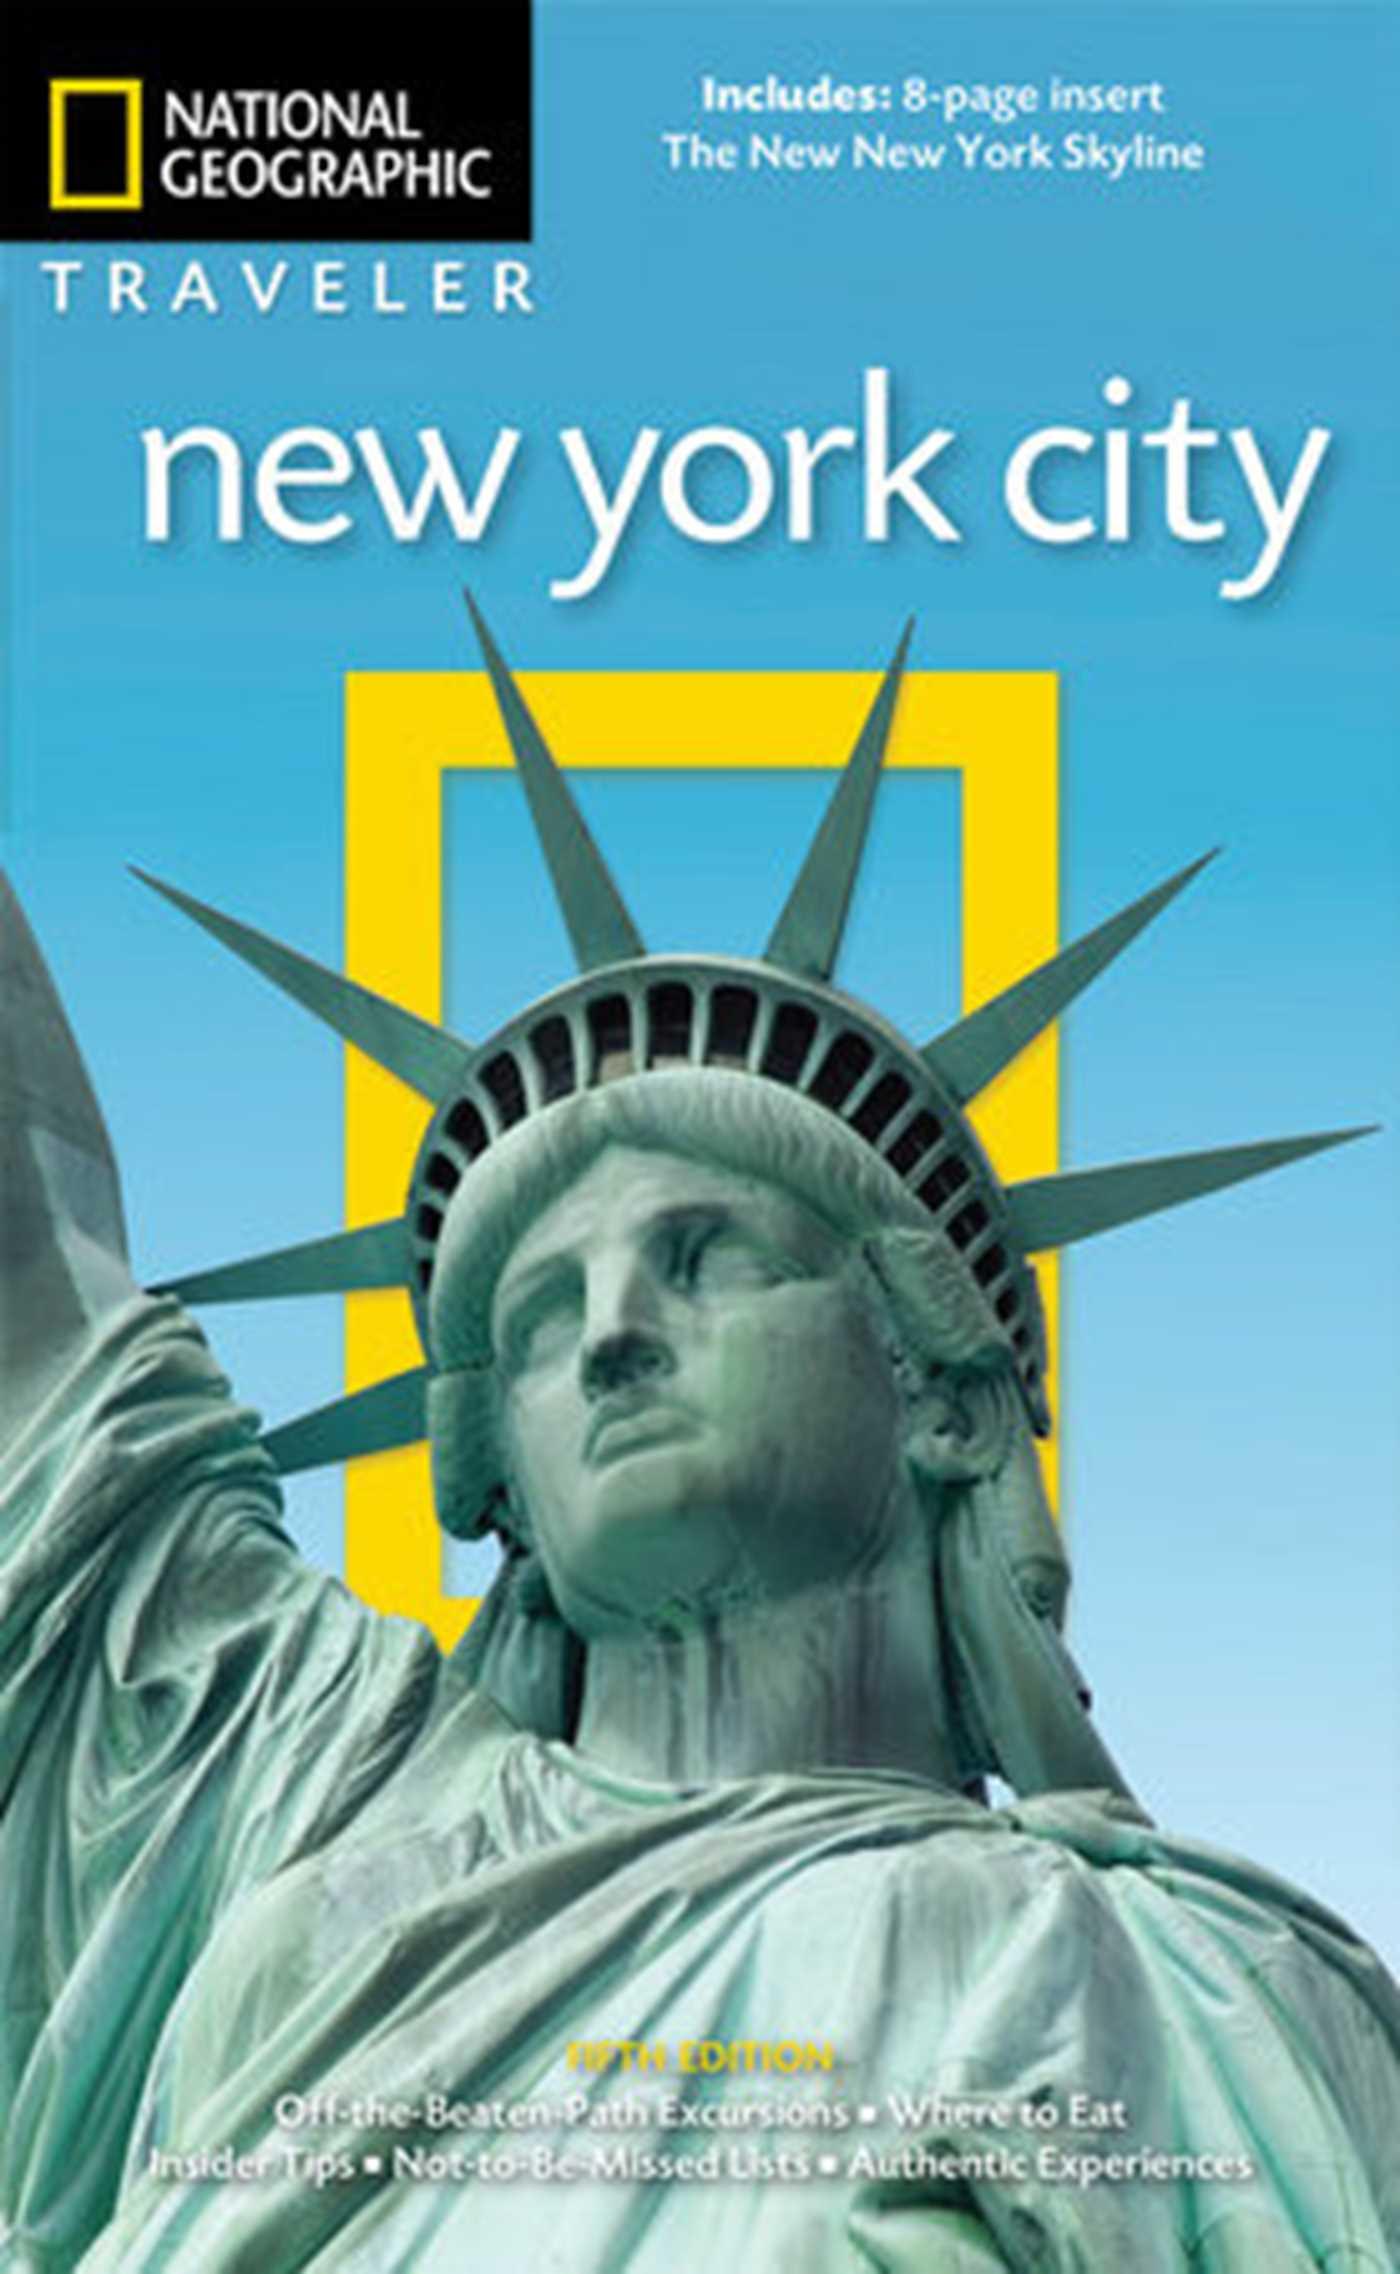 Nat geo traveler new york city 9781426218415 hr